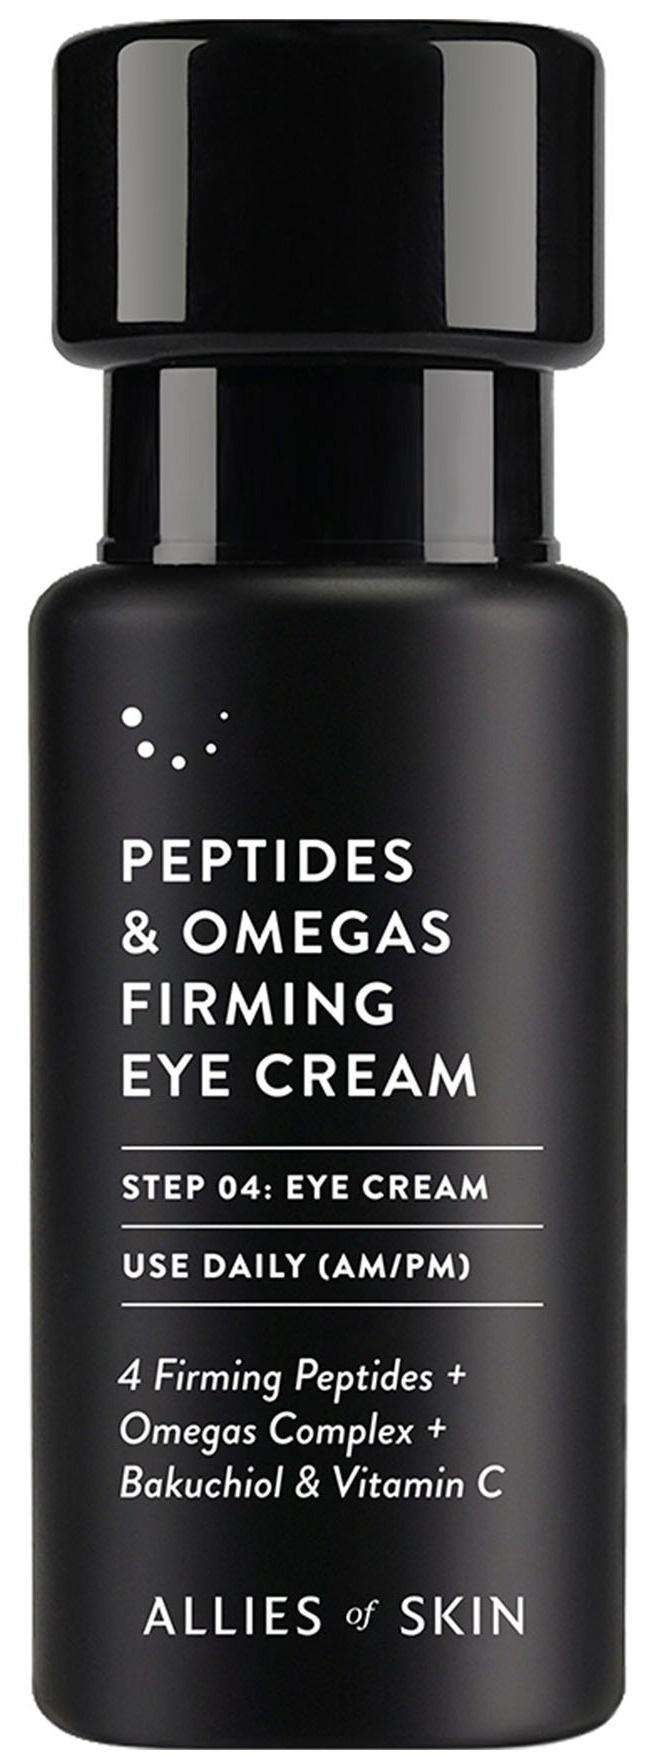 Allies of Skin Peptides & Omegas Firming Eye Cream